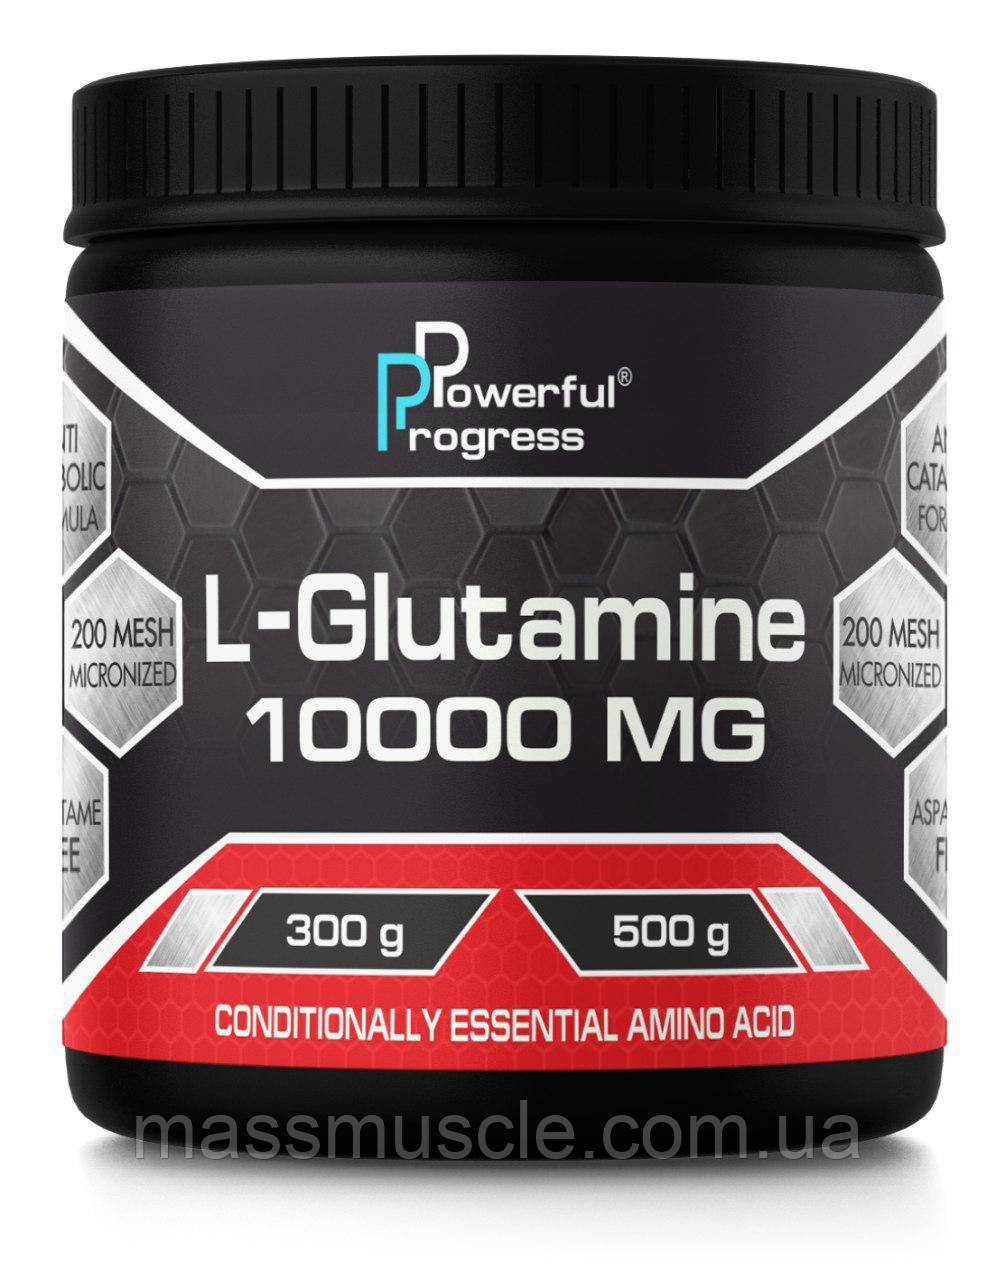 Глутамин Powerful Progress L-Glutamine 300g